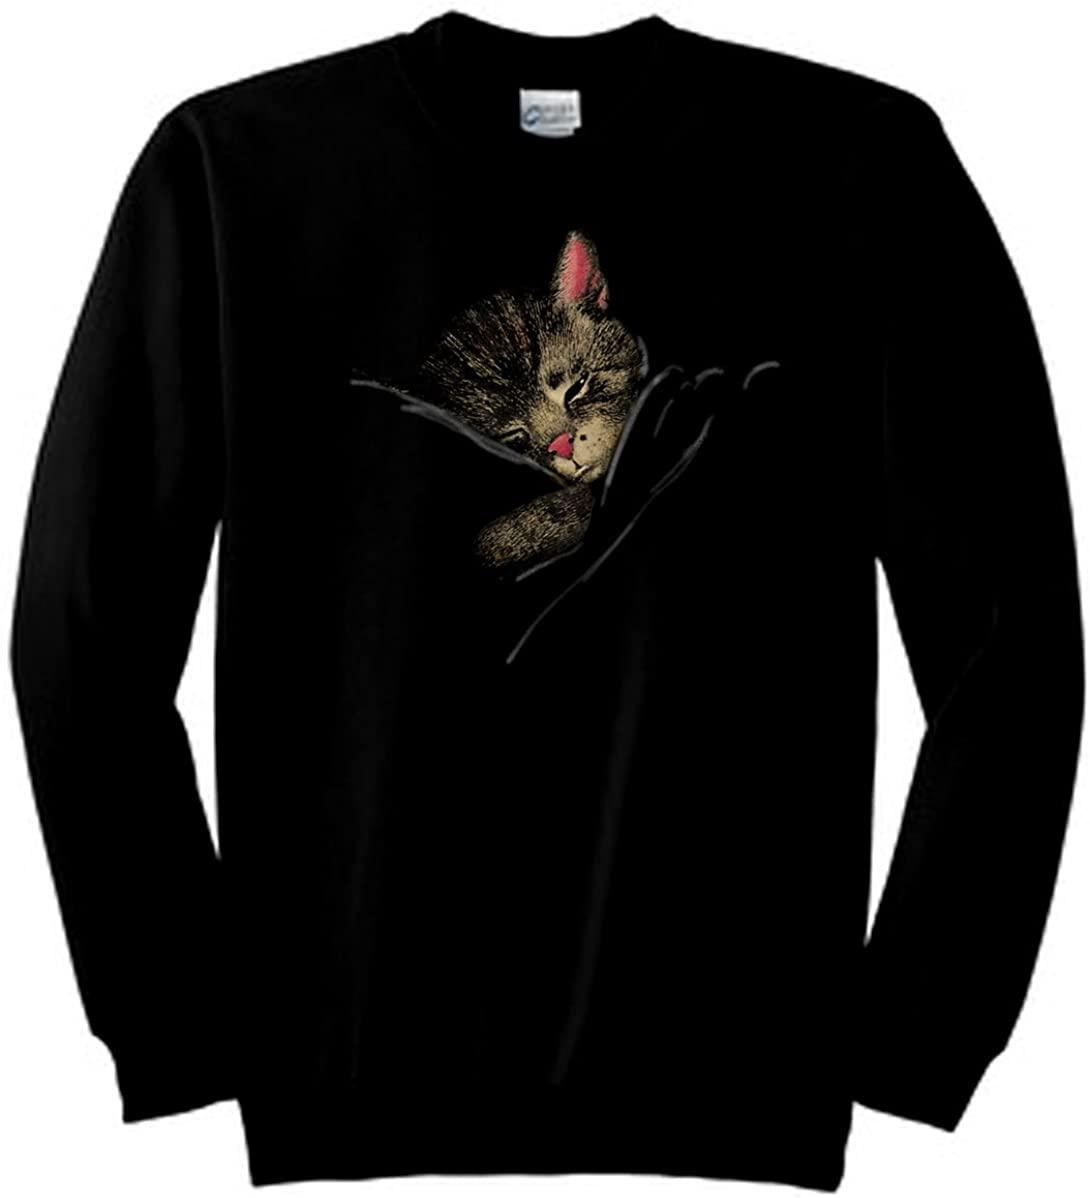 Daylight Sales Nighttime Chessie The Sleeping Kitten Railroad Sweatshirt (Black)